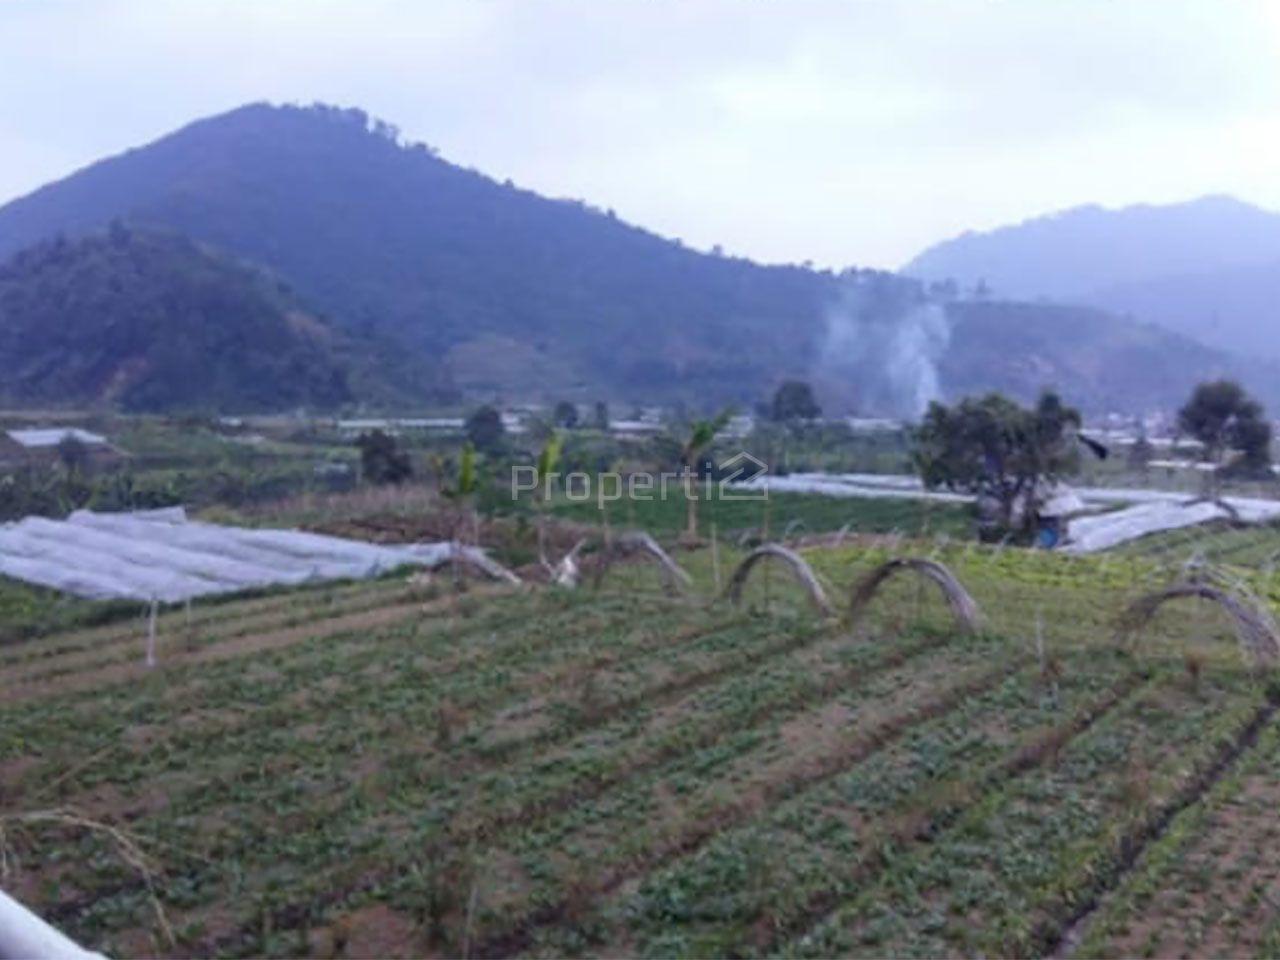 Lahan Komersial Pinggir Jalan di Bogor, Jawa Barat